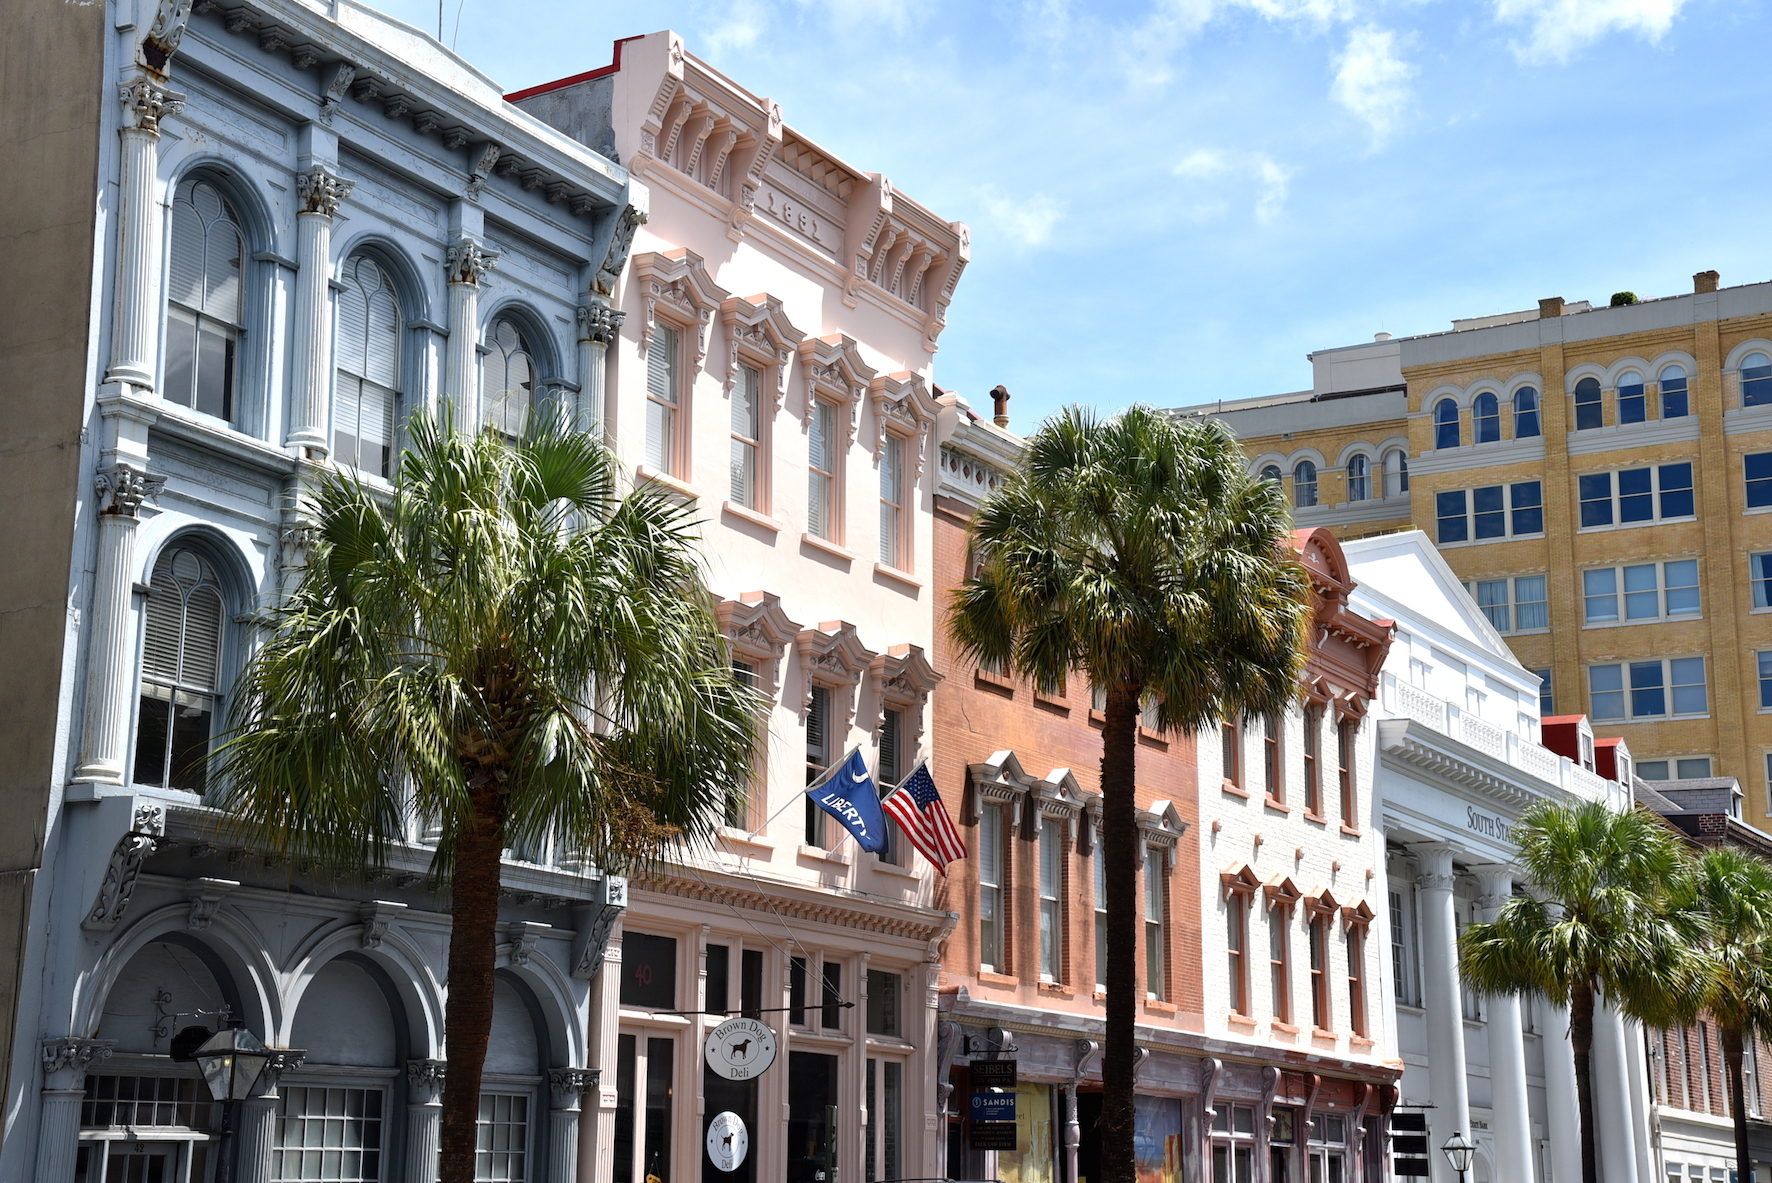 Visiting Charleston, South Carolina during a one day trip